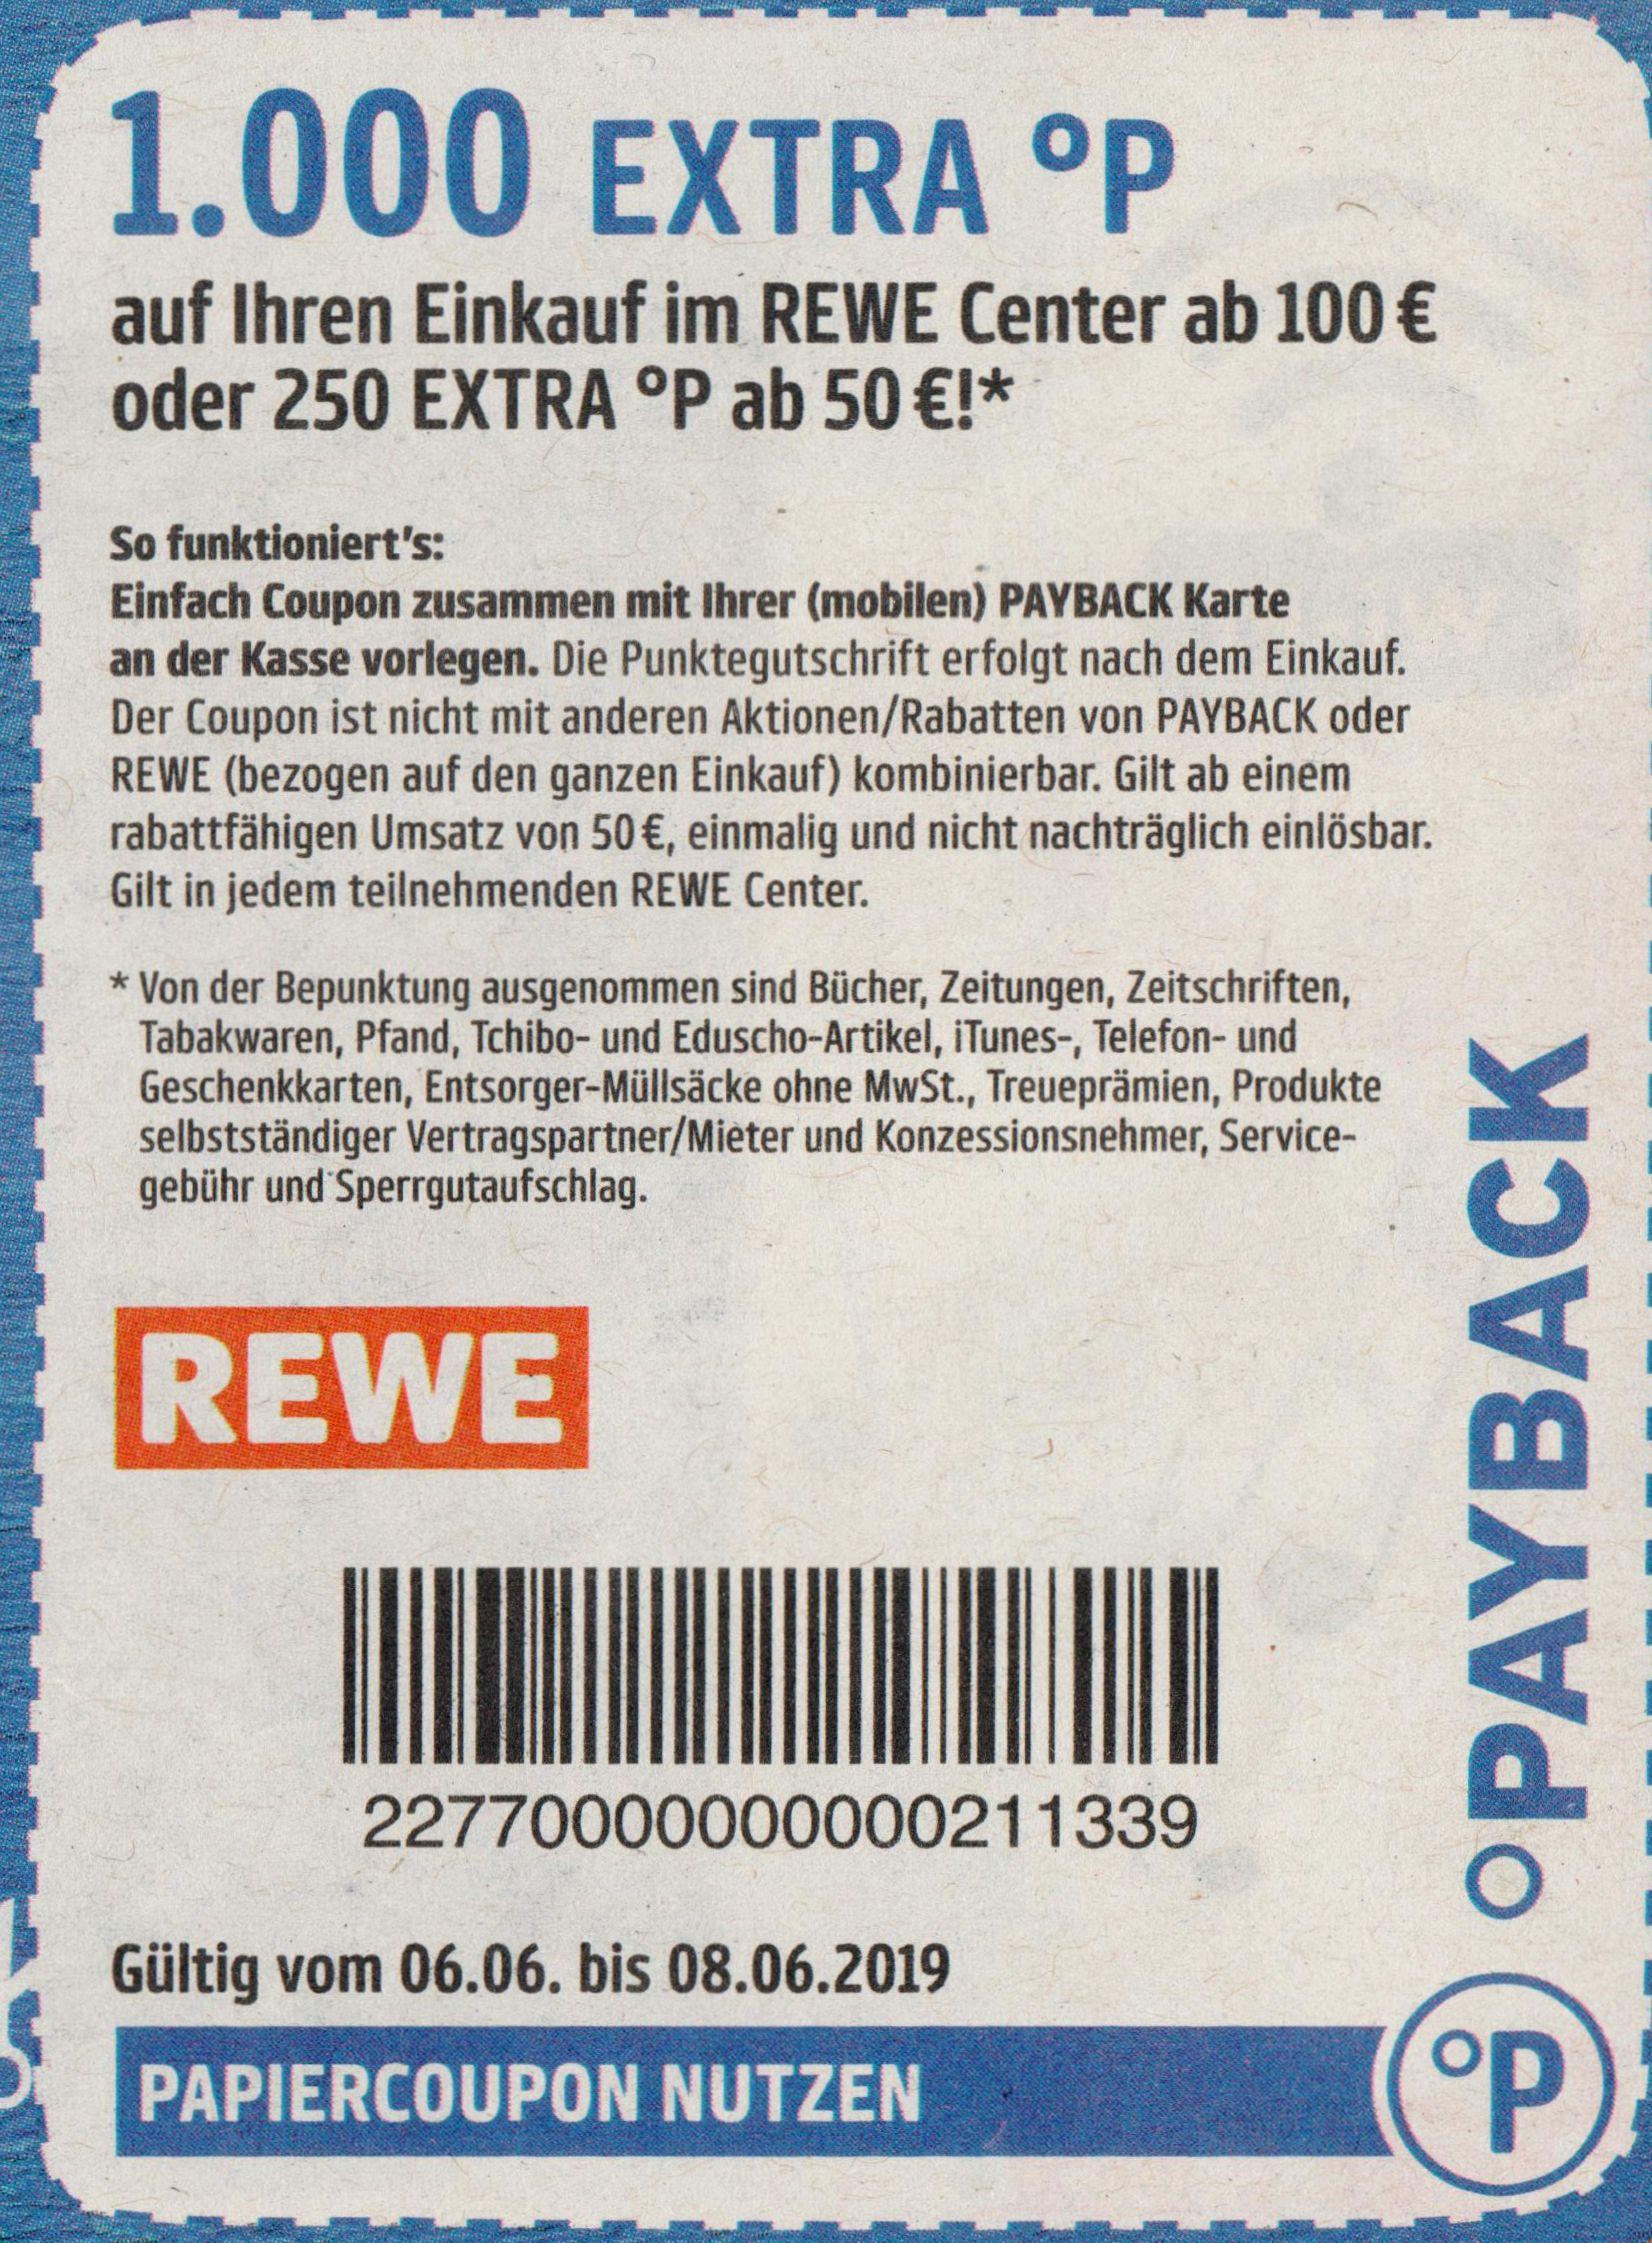 WWW.PAYBACK.DE/REWE 1000